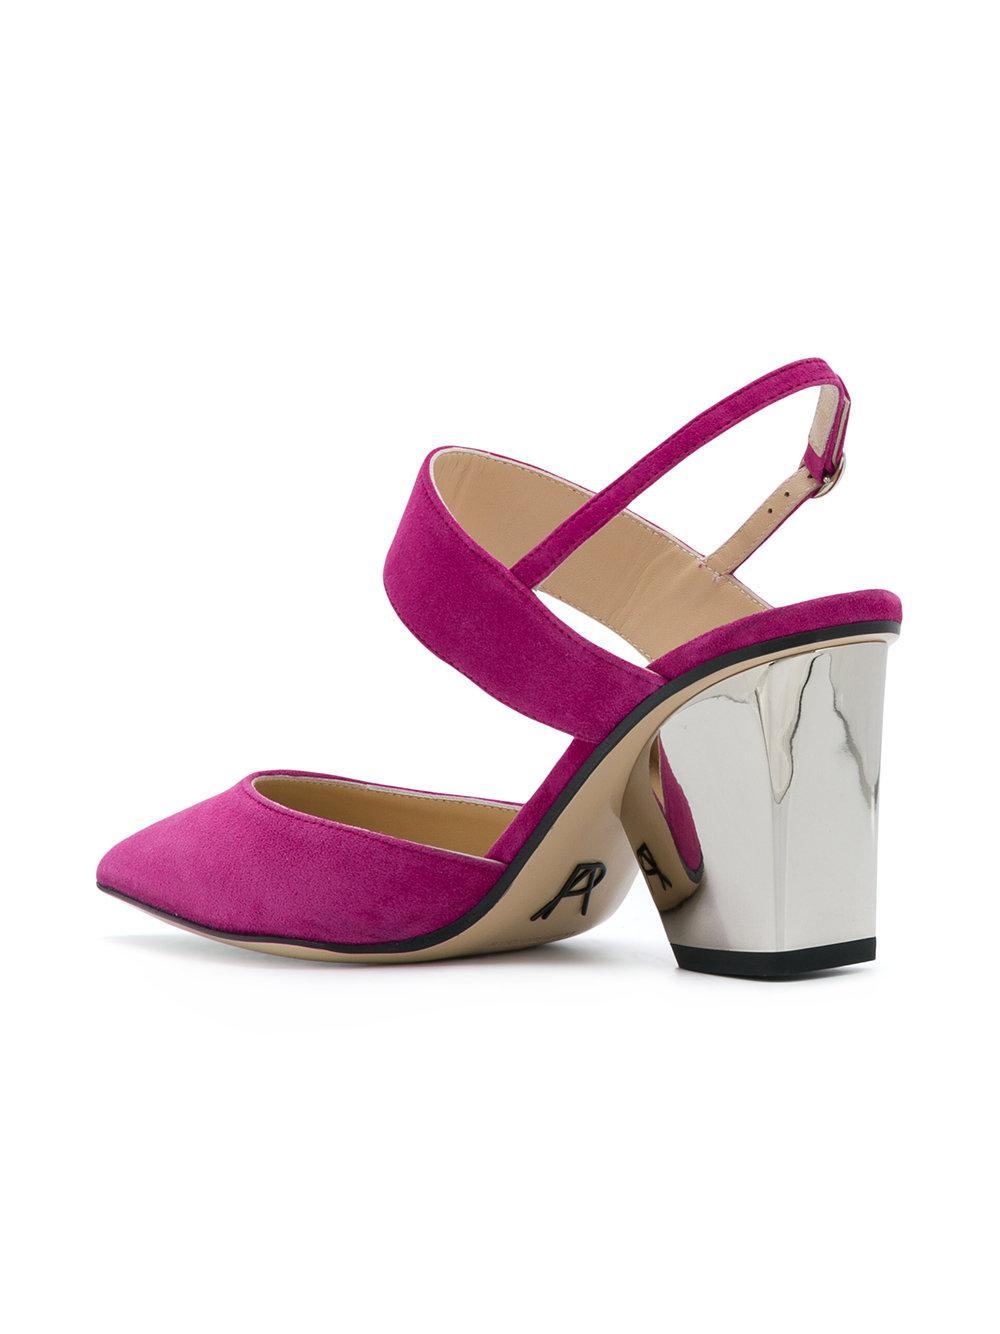 Pawson pumps - Pink & Purple PAUL ANDREW YCJiK3